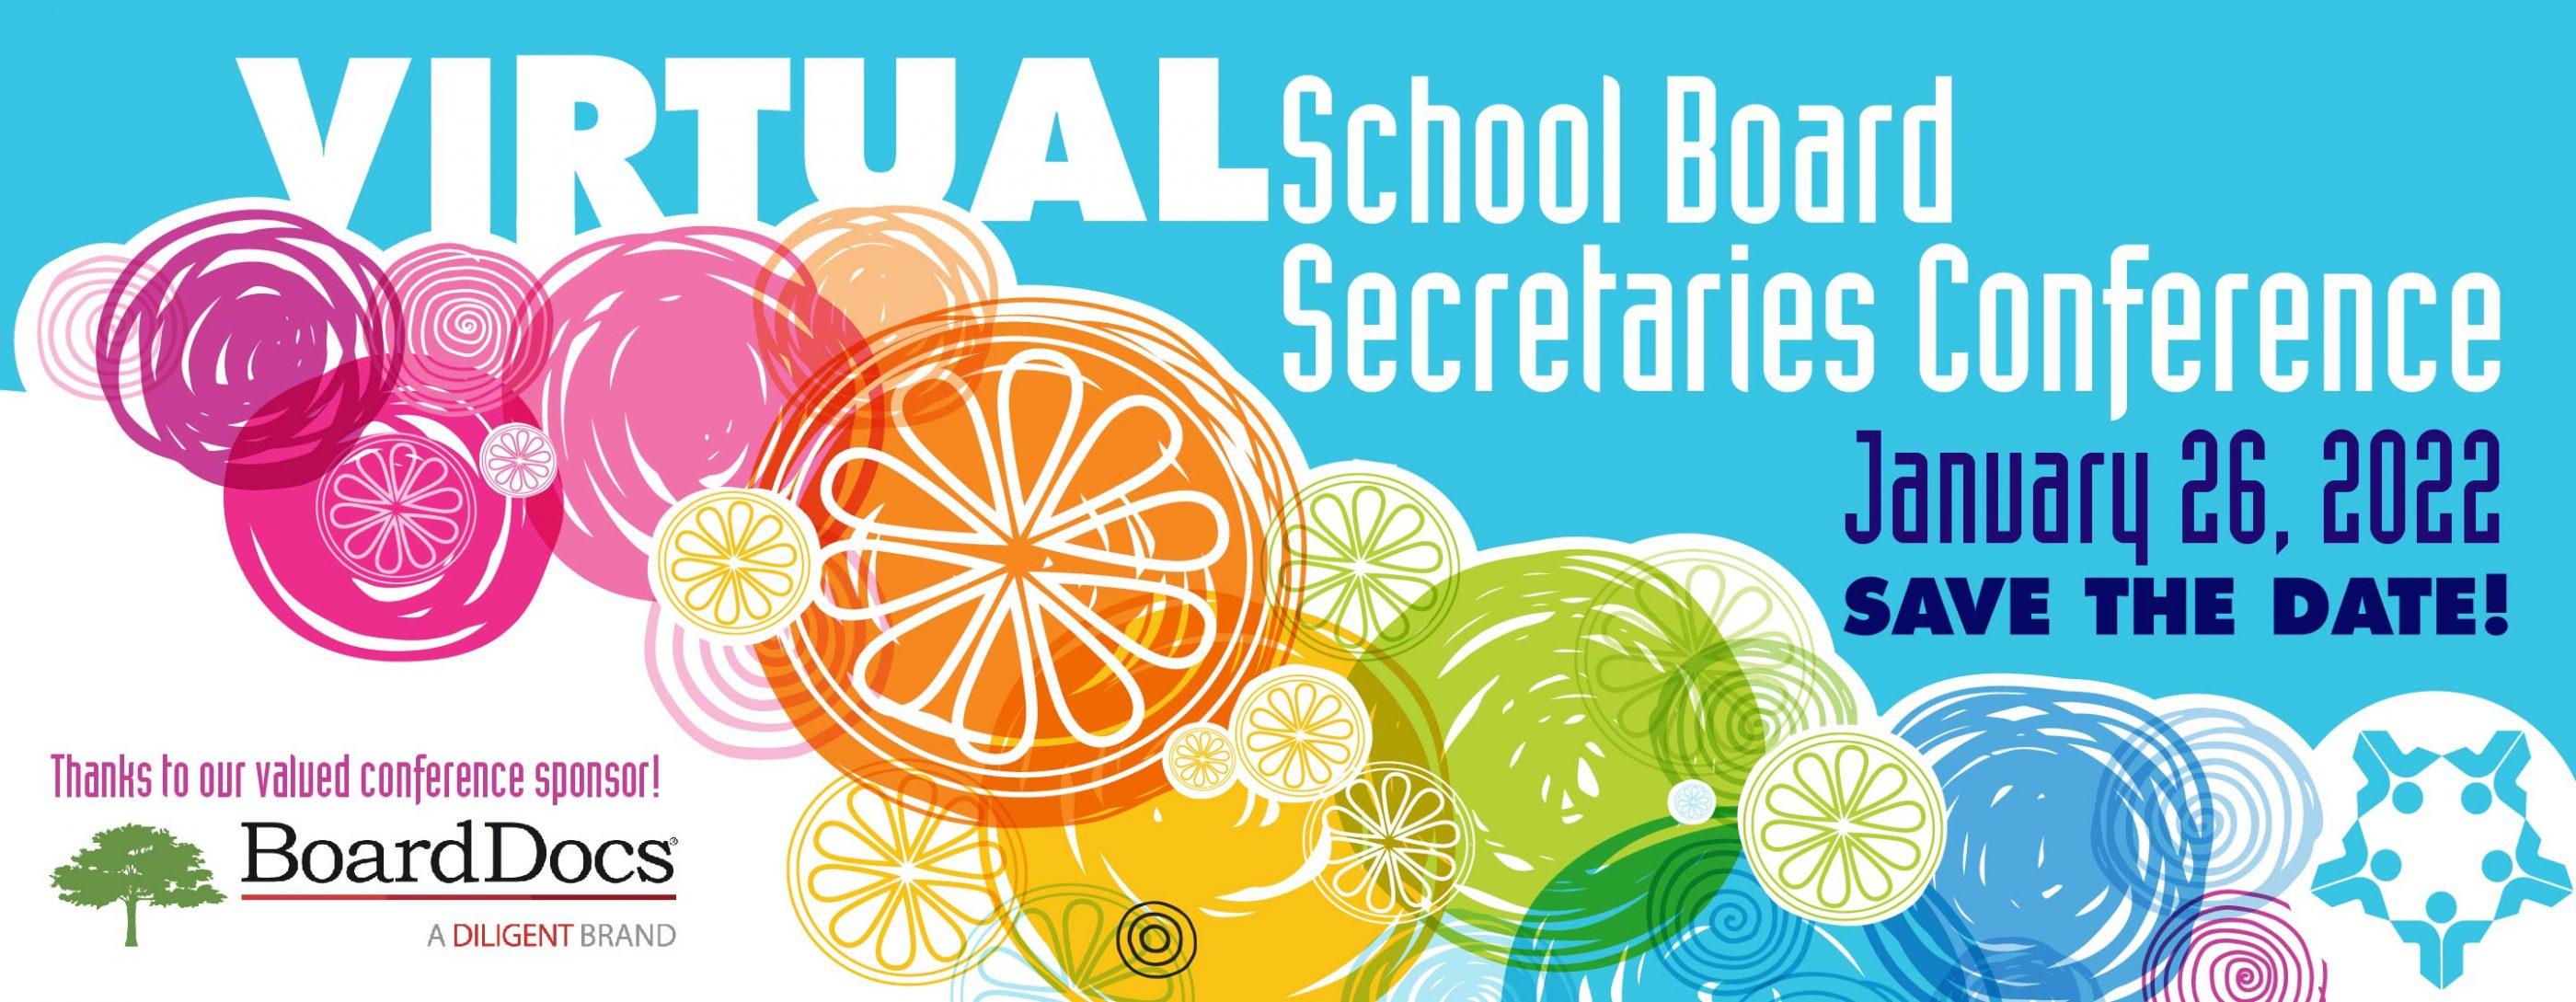 Save the date: School Board Secretaries conference